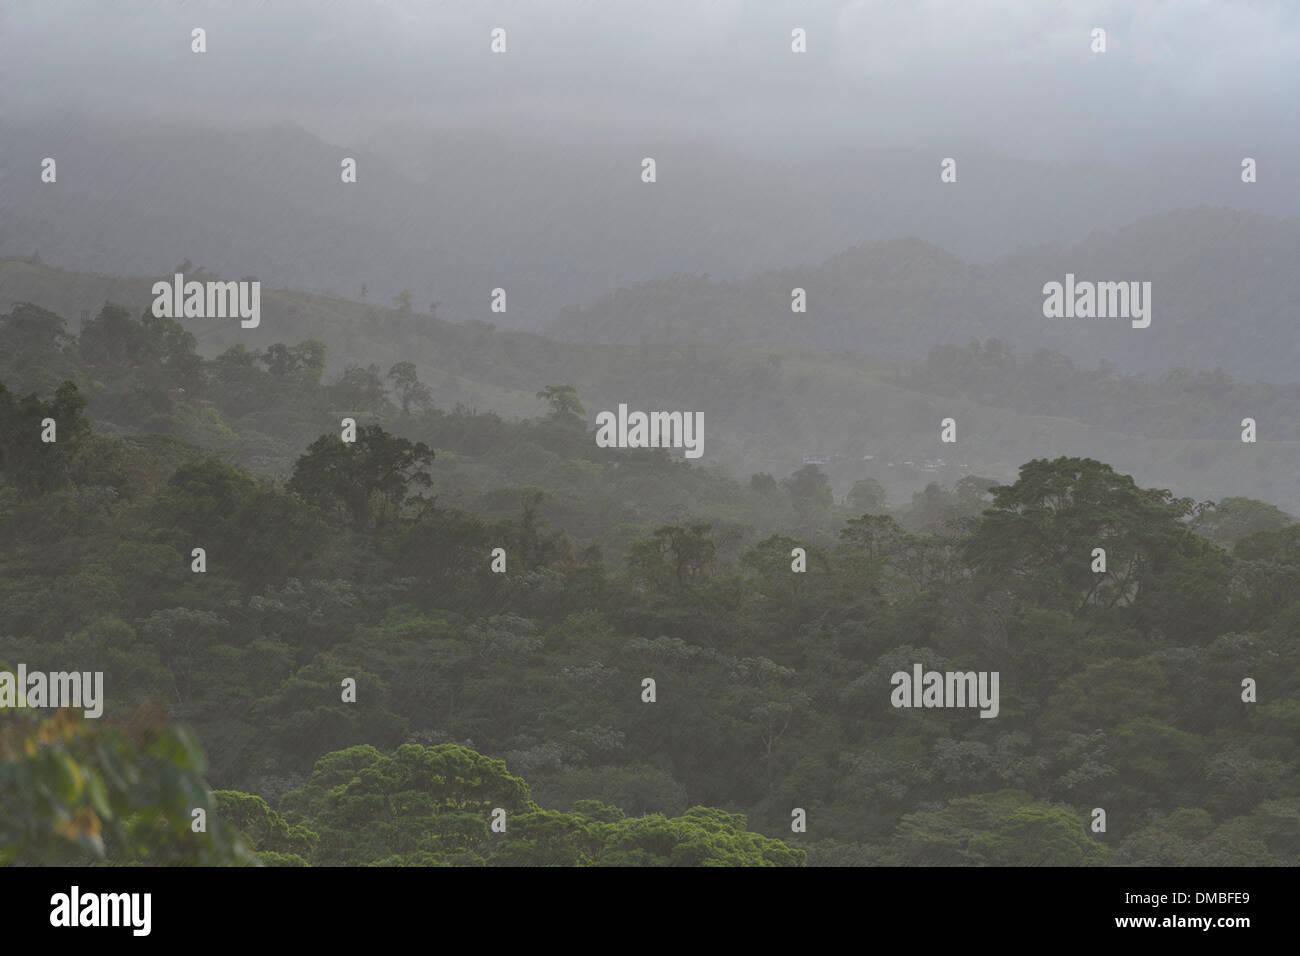 rain falling in a Costa Rican rain forest near lake Arenal. - Stock Image